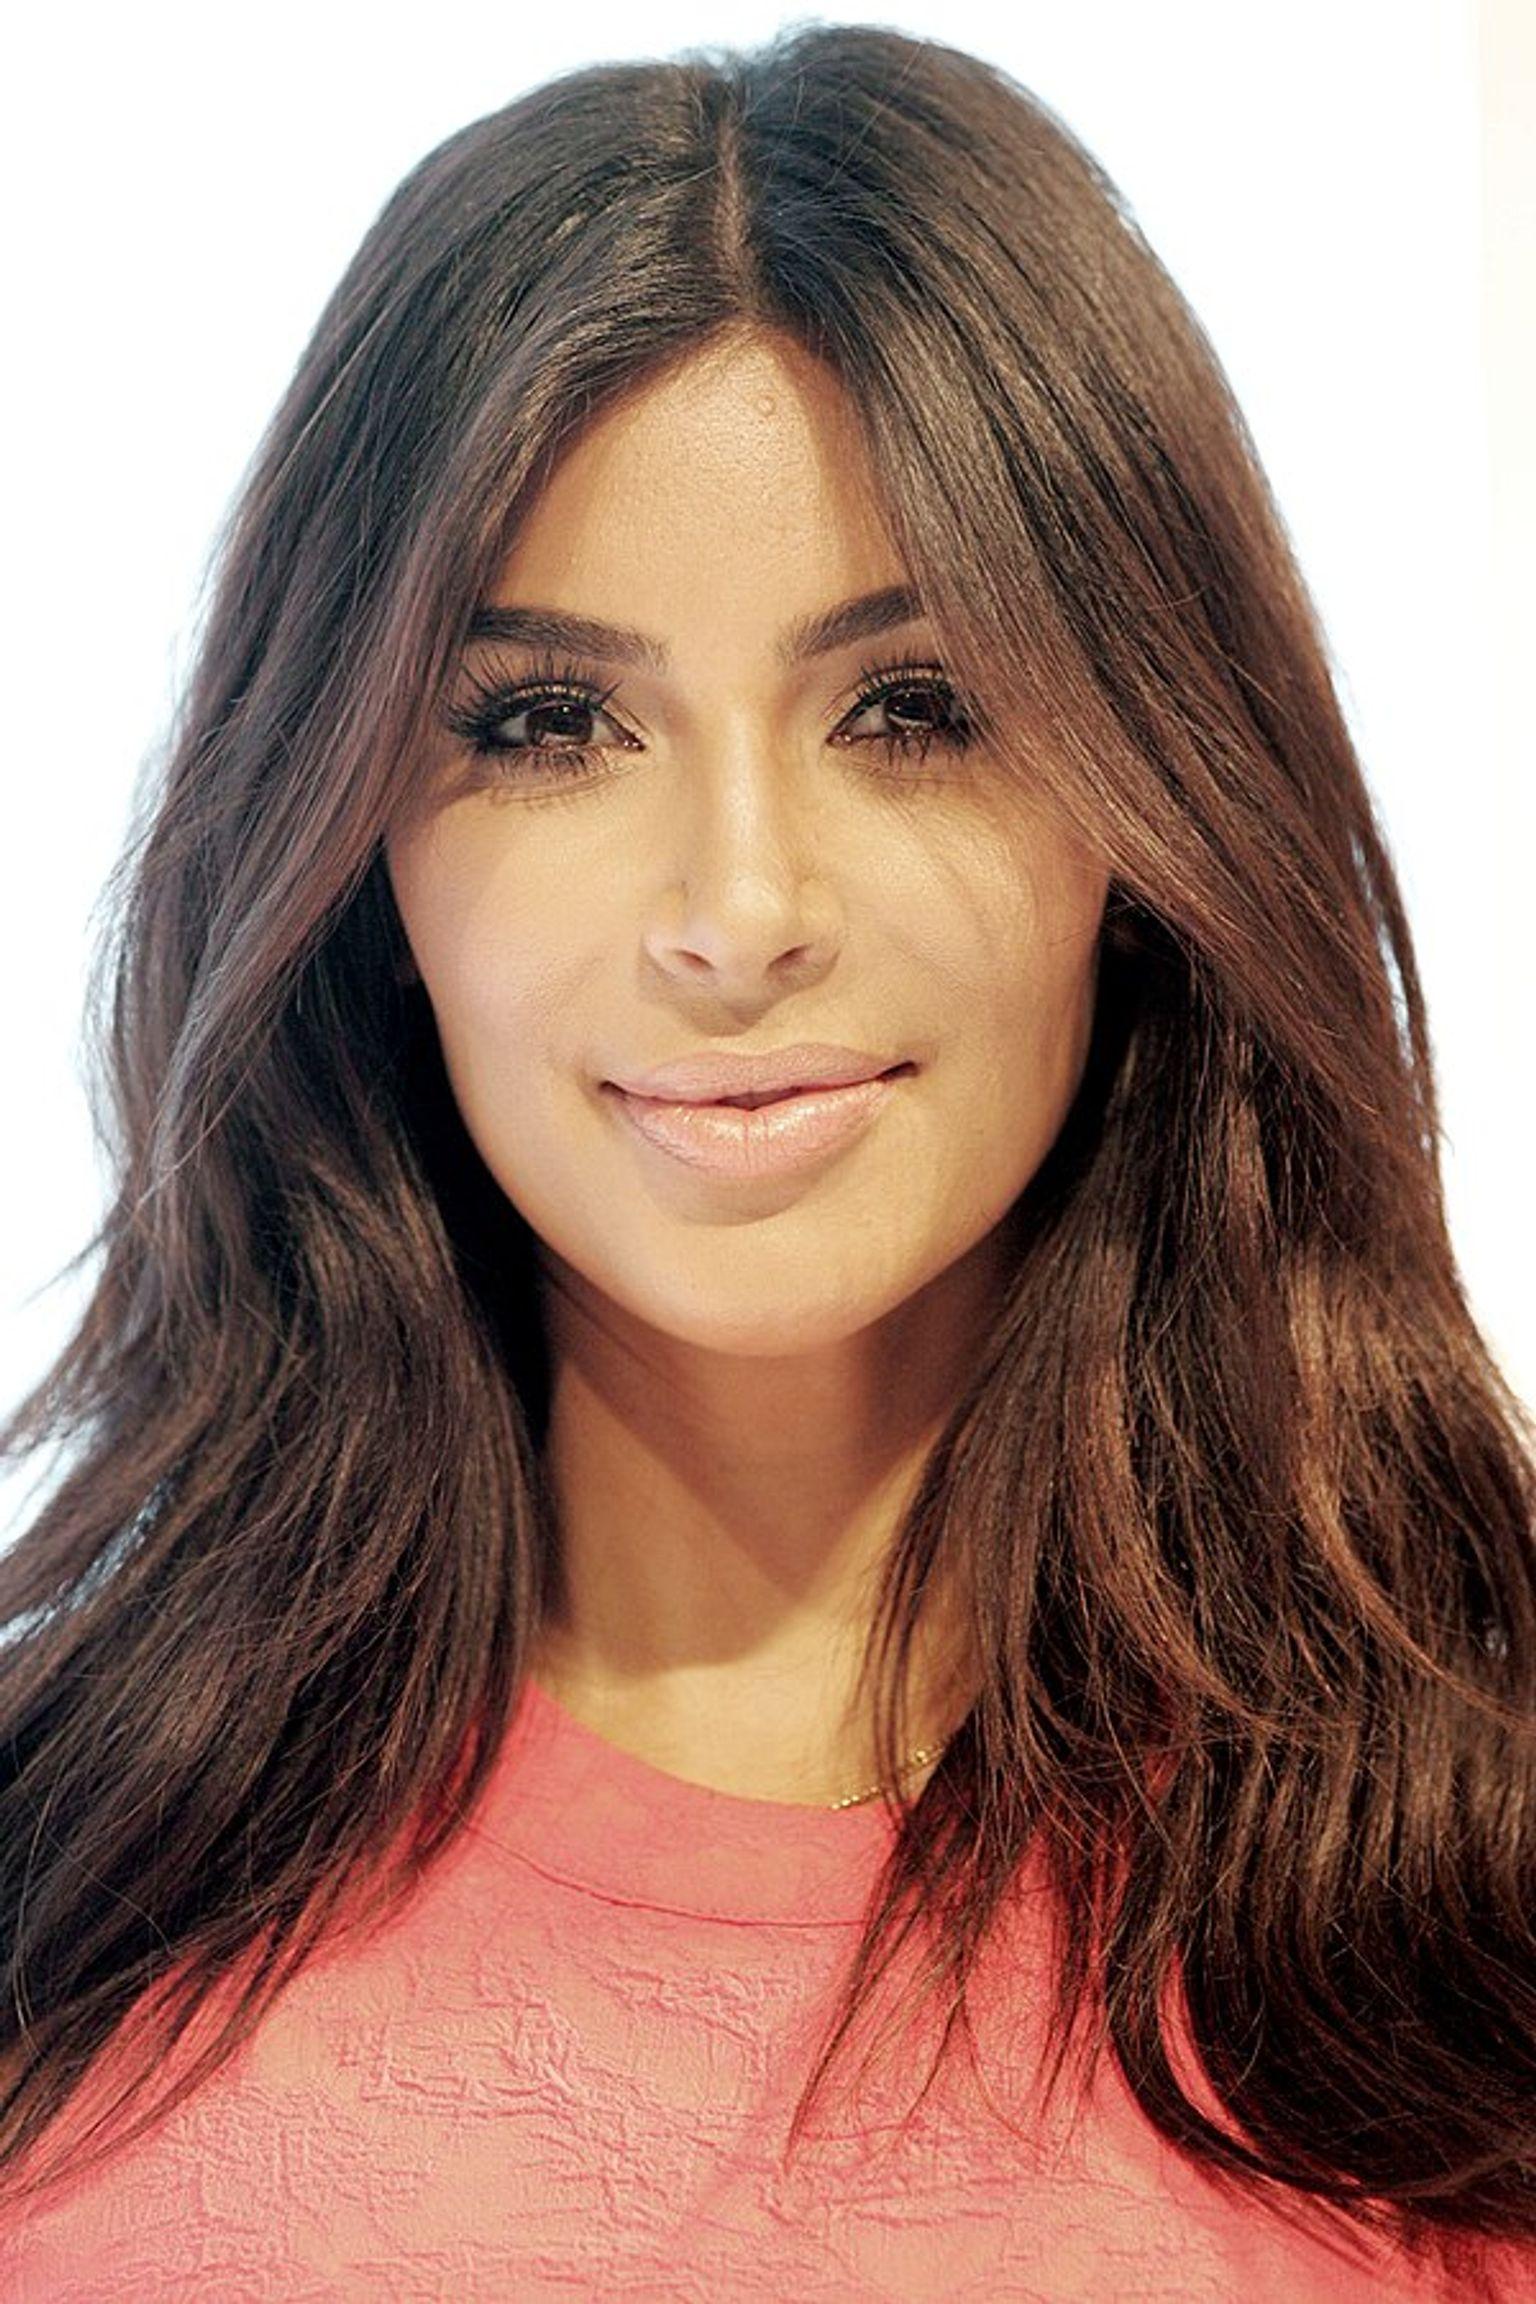 Kim Kardashian: Reality 'doll' face?